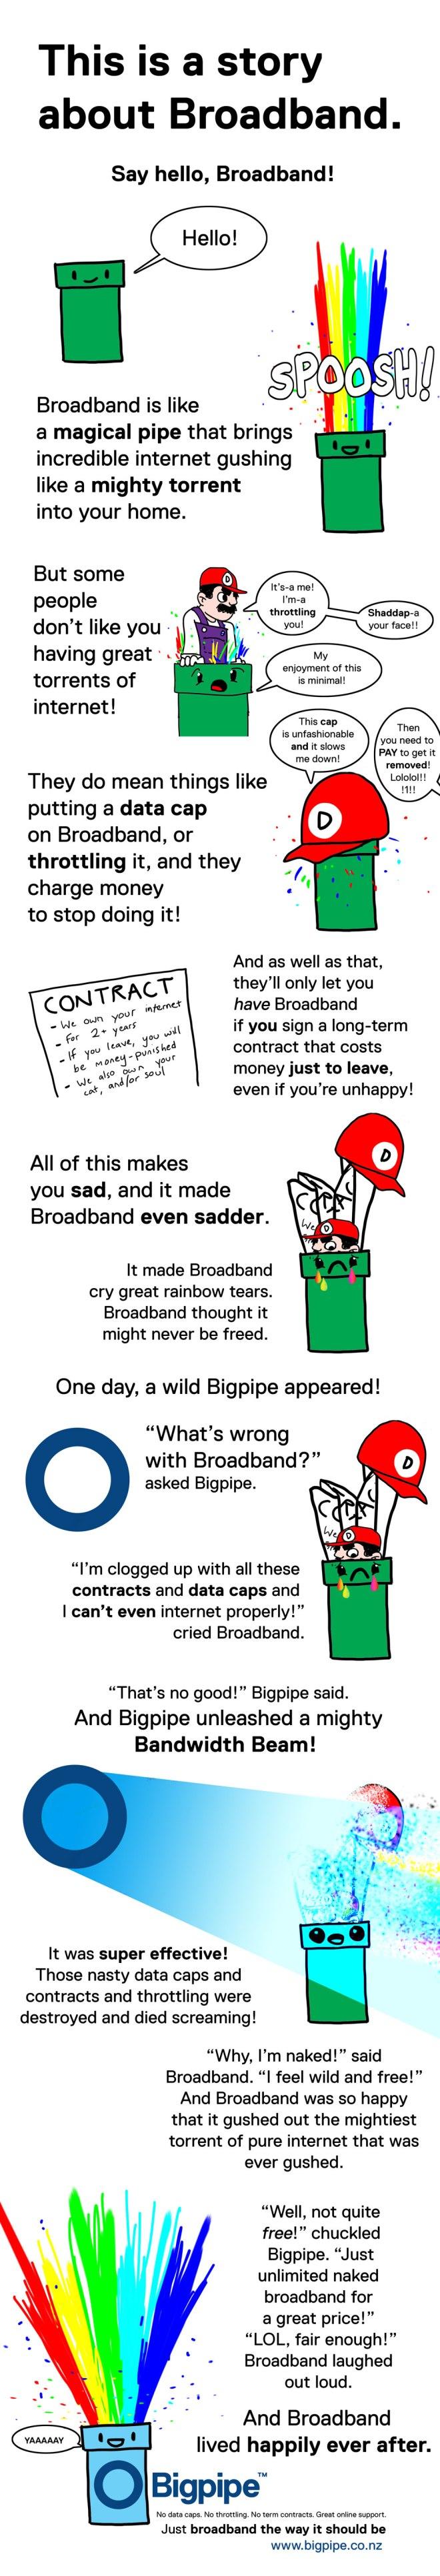 broadband-story-web